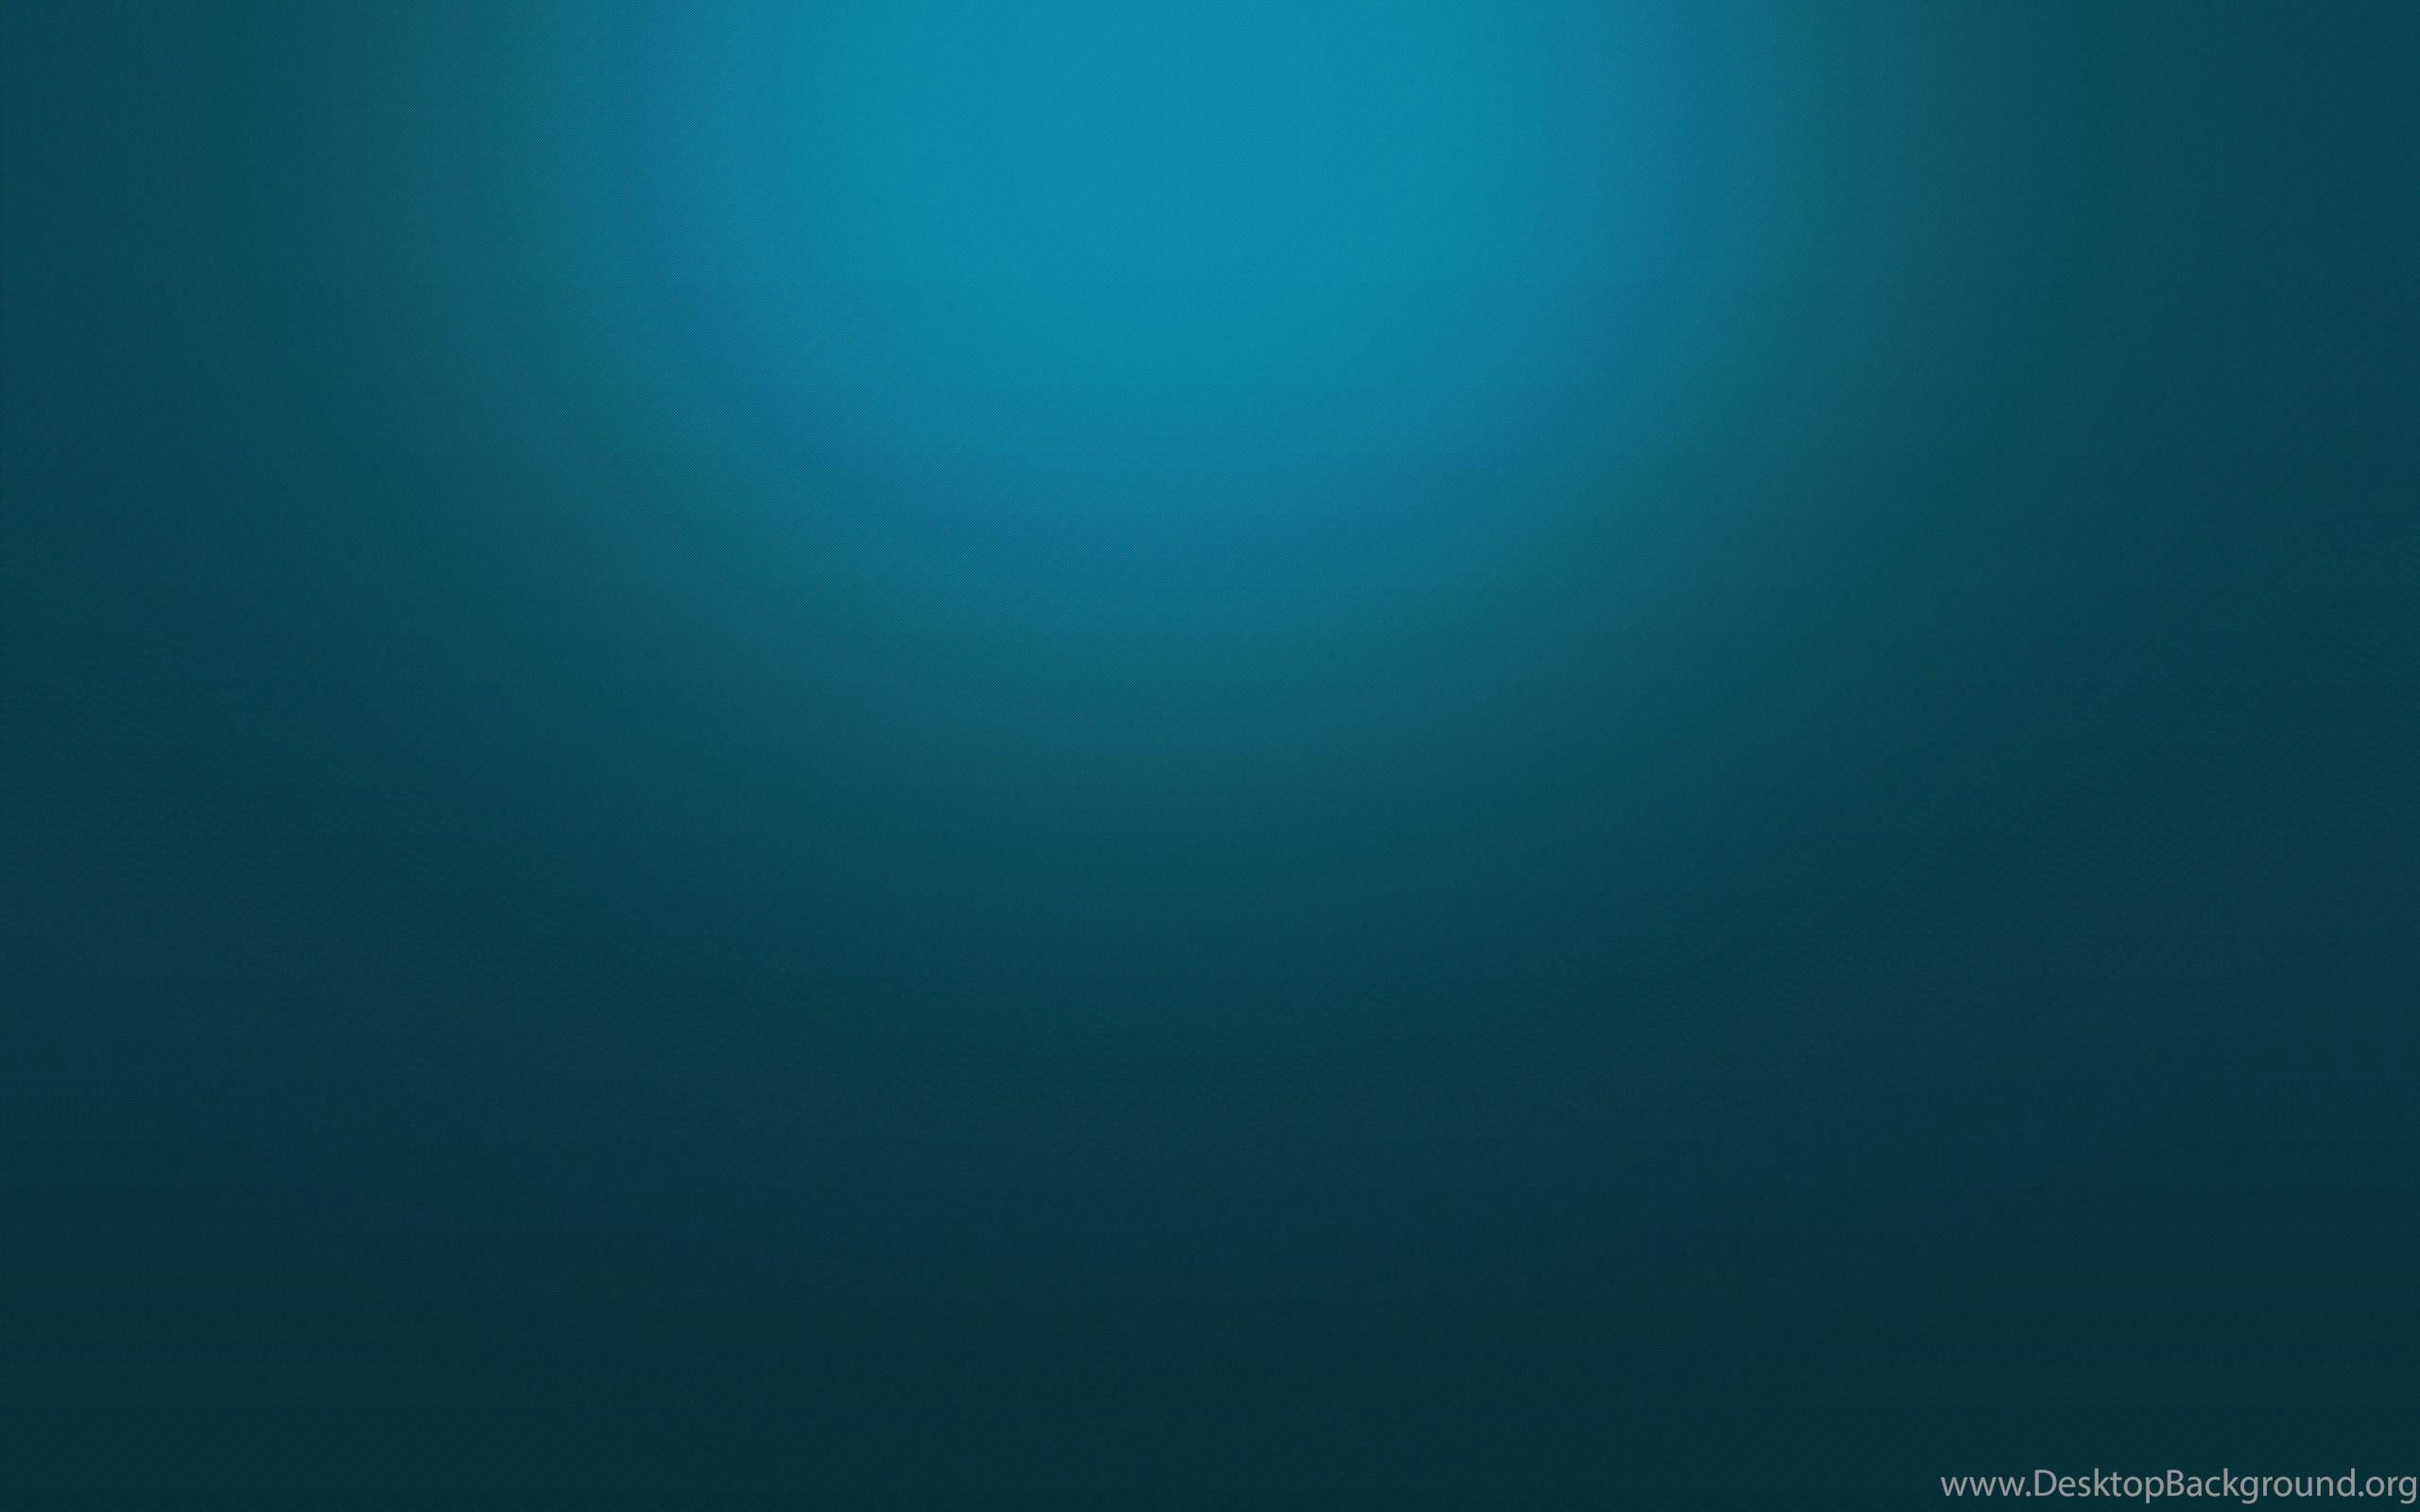 Solid Color S Wallpapers Desktop Background